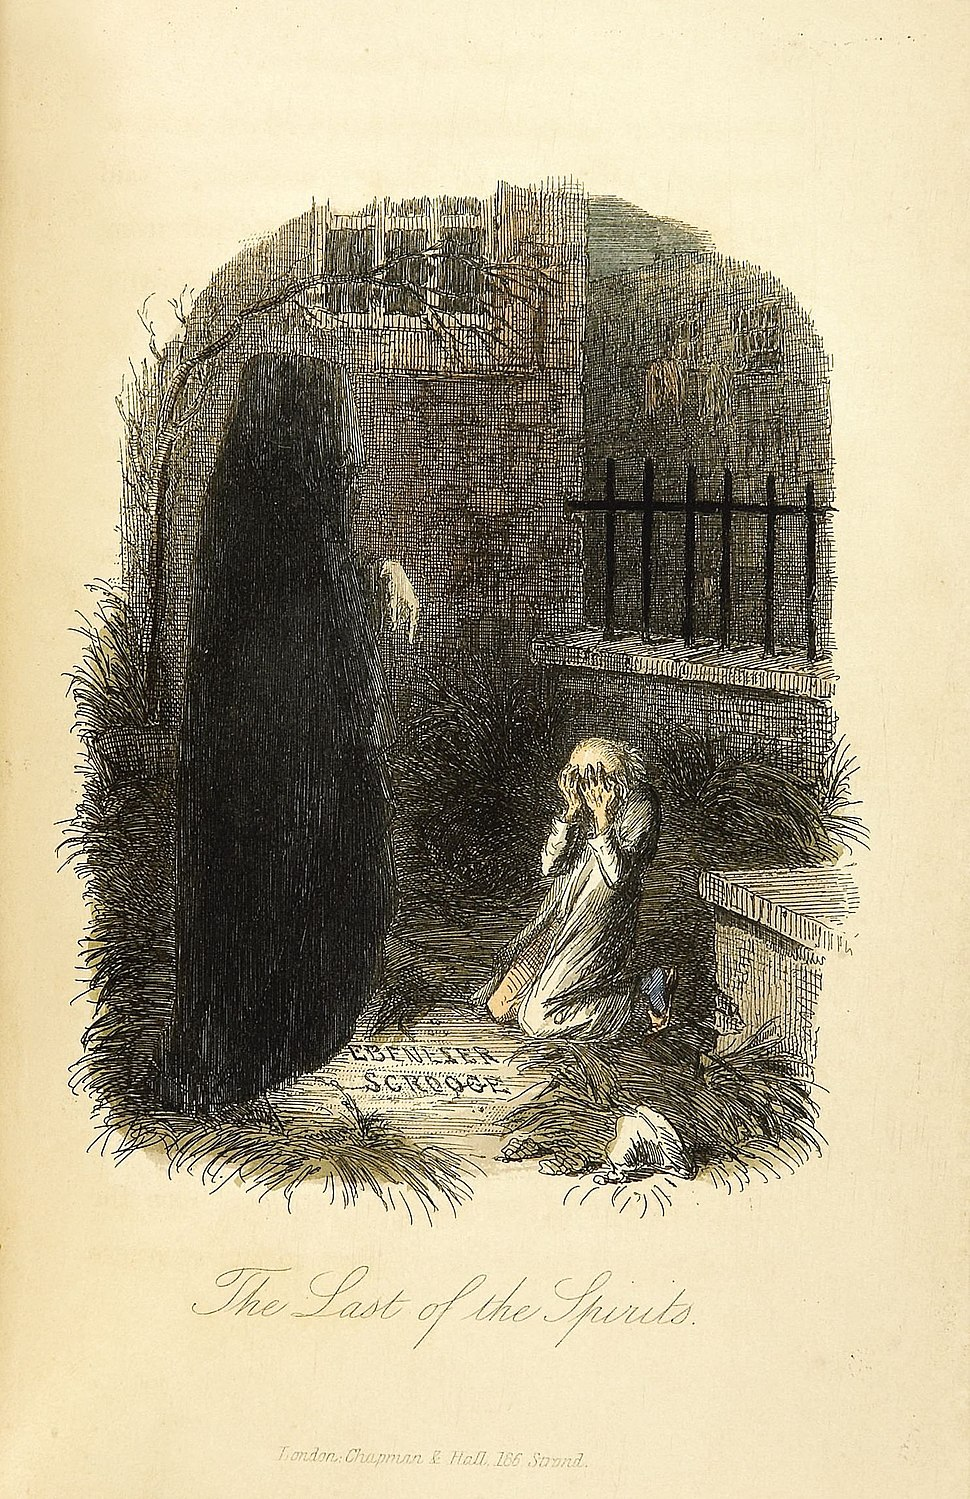 The Last of the Spirits-John Leech, 1843